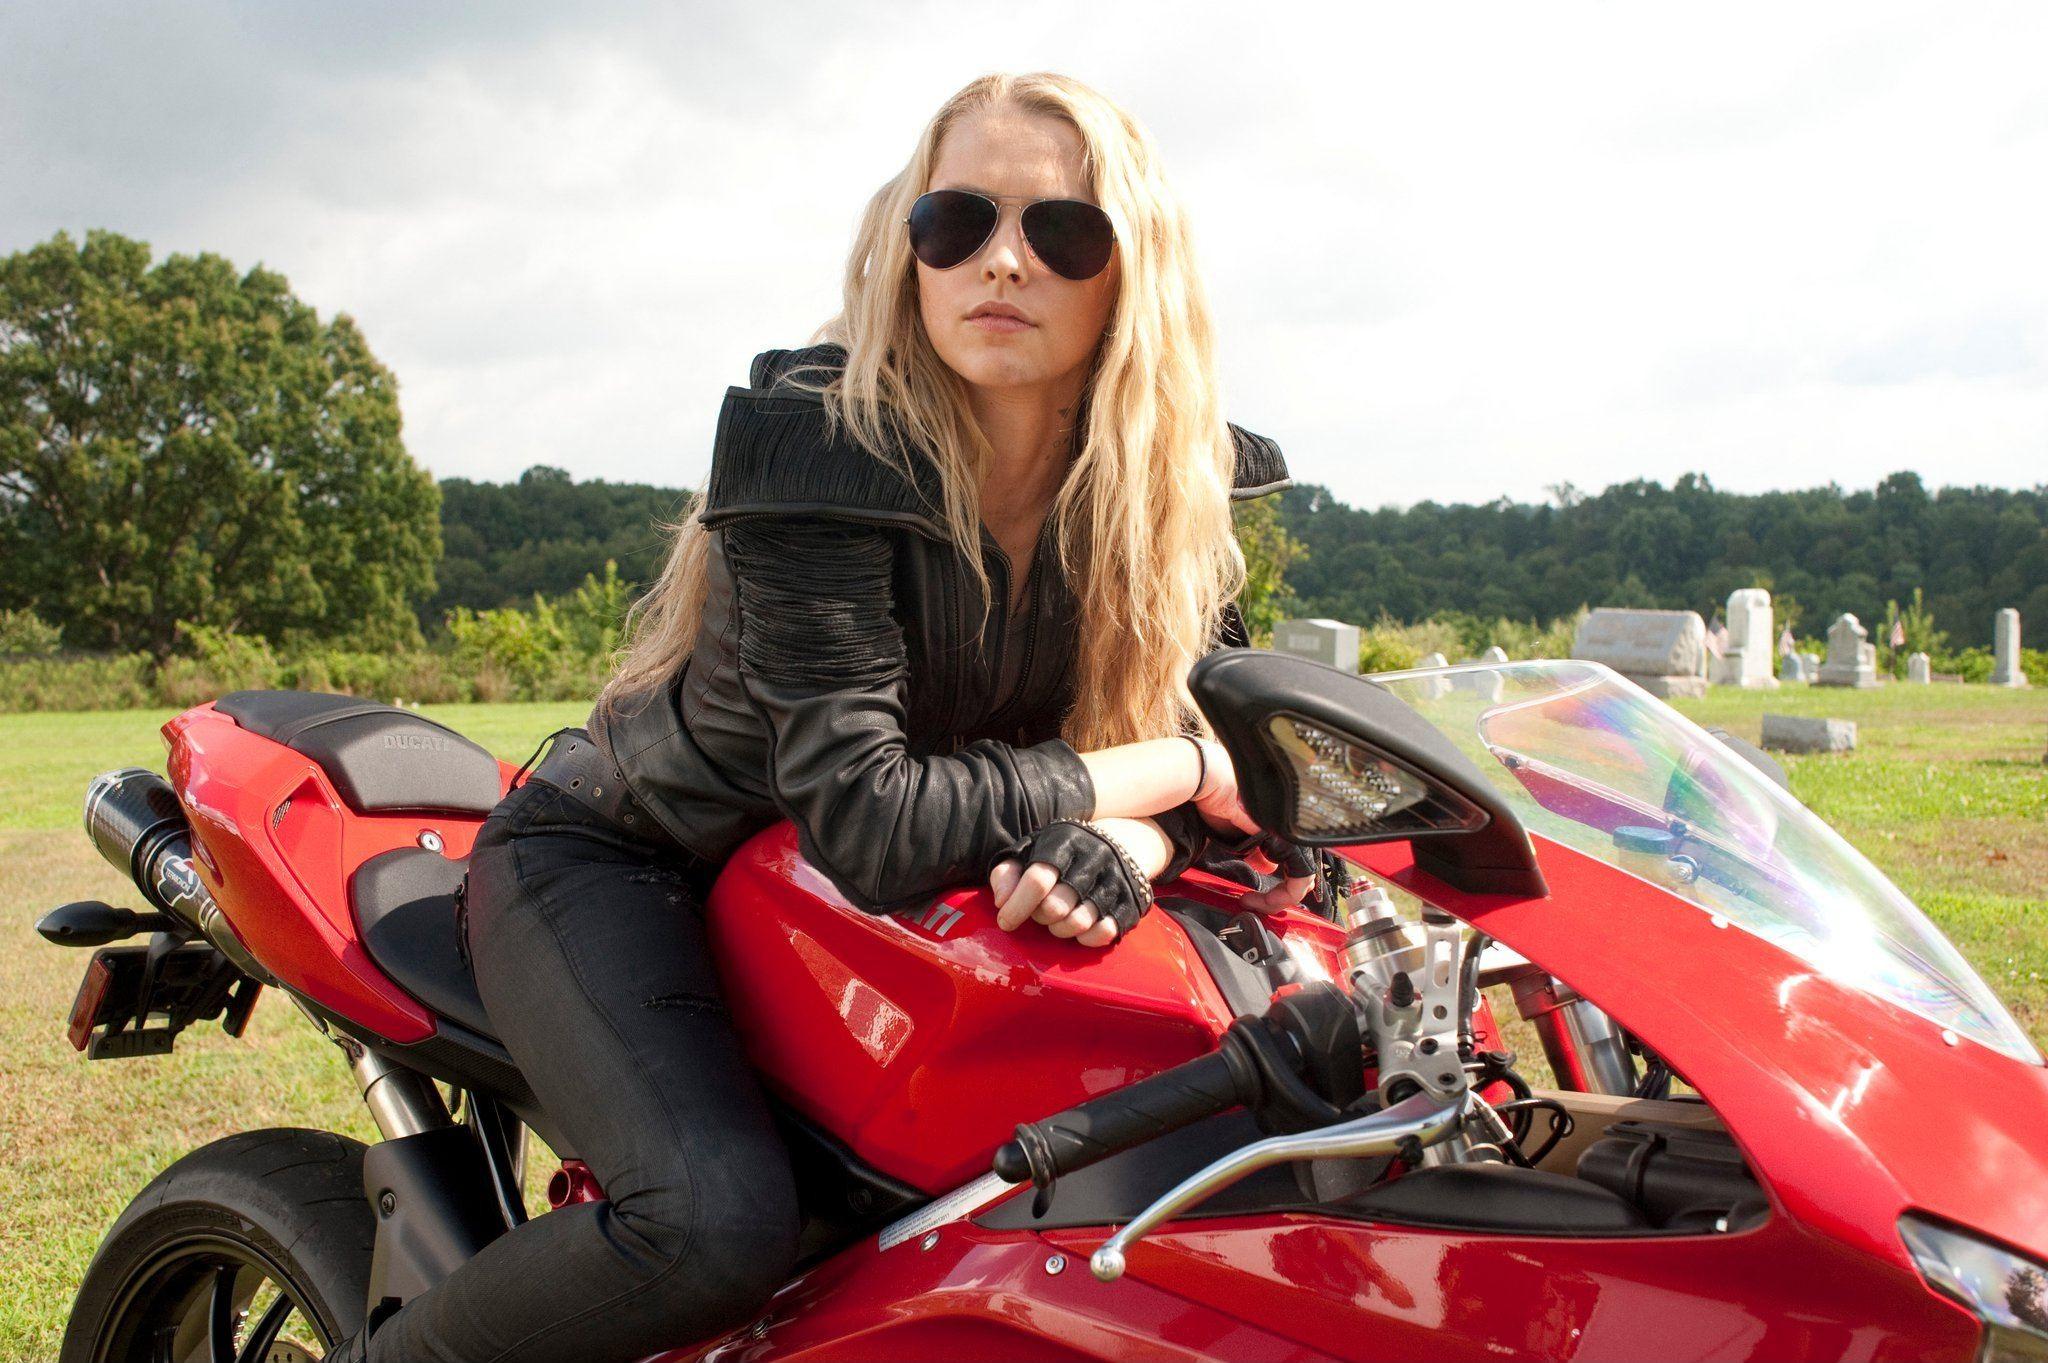 Ducati Sportbike 848 I Am Number Four Blonde Teresa Palmer ... I Am Number Four Movie Six